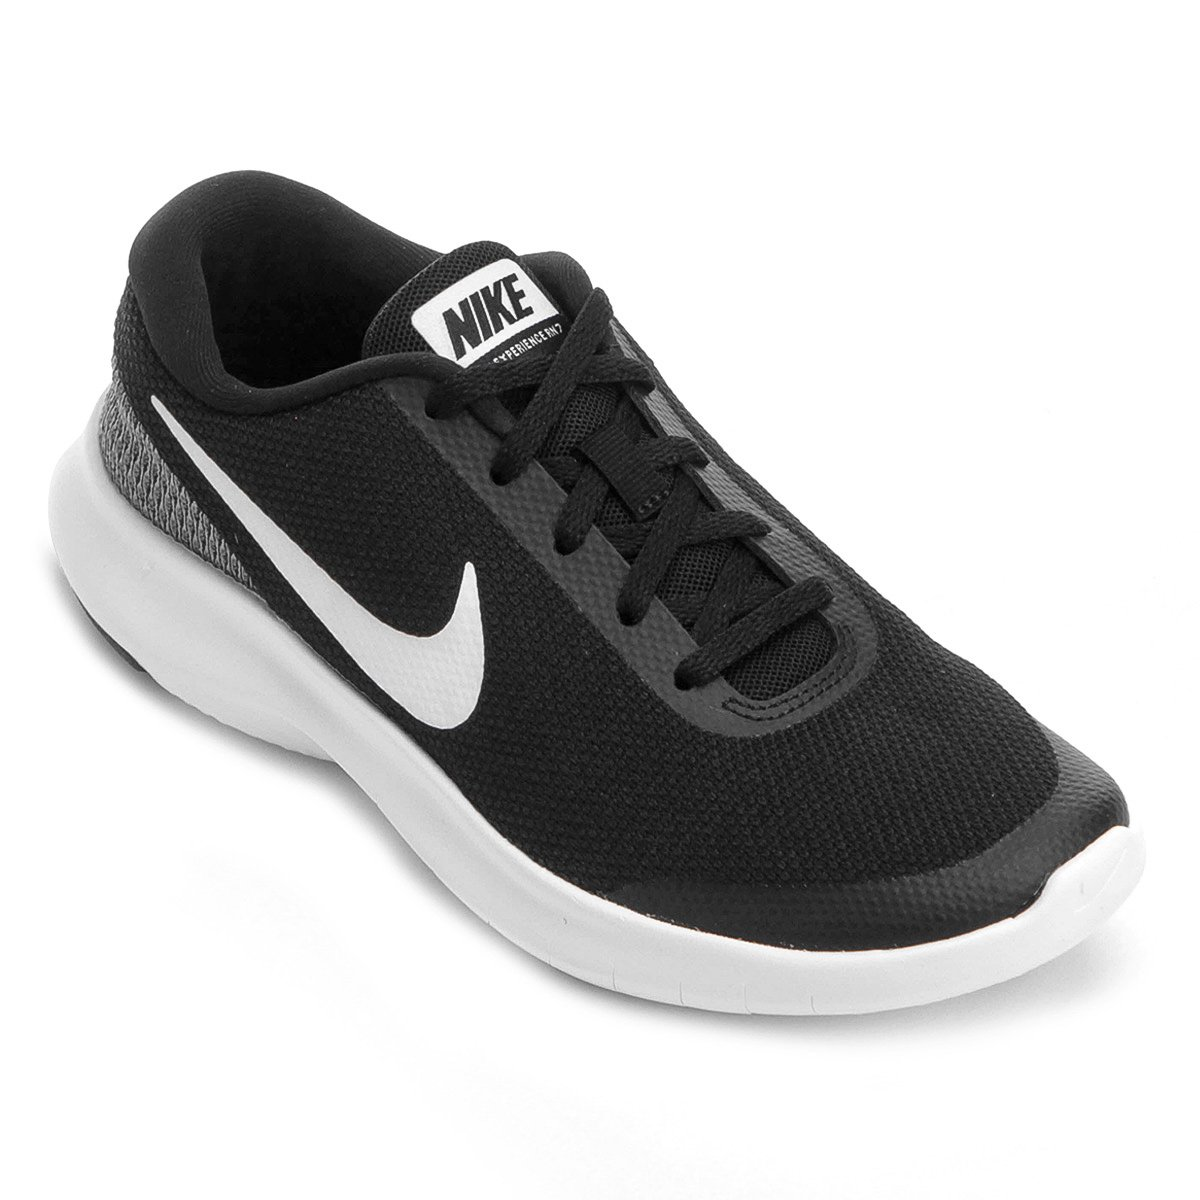 Tênis Nike Flex Experience Rn 7 Feminino Preto E Branco